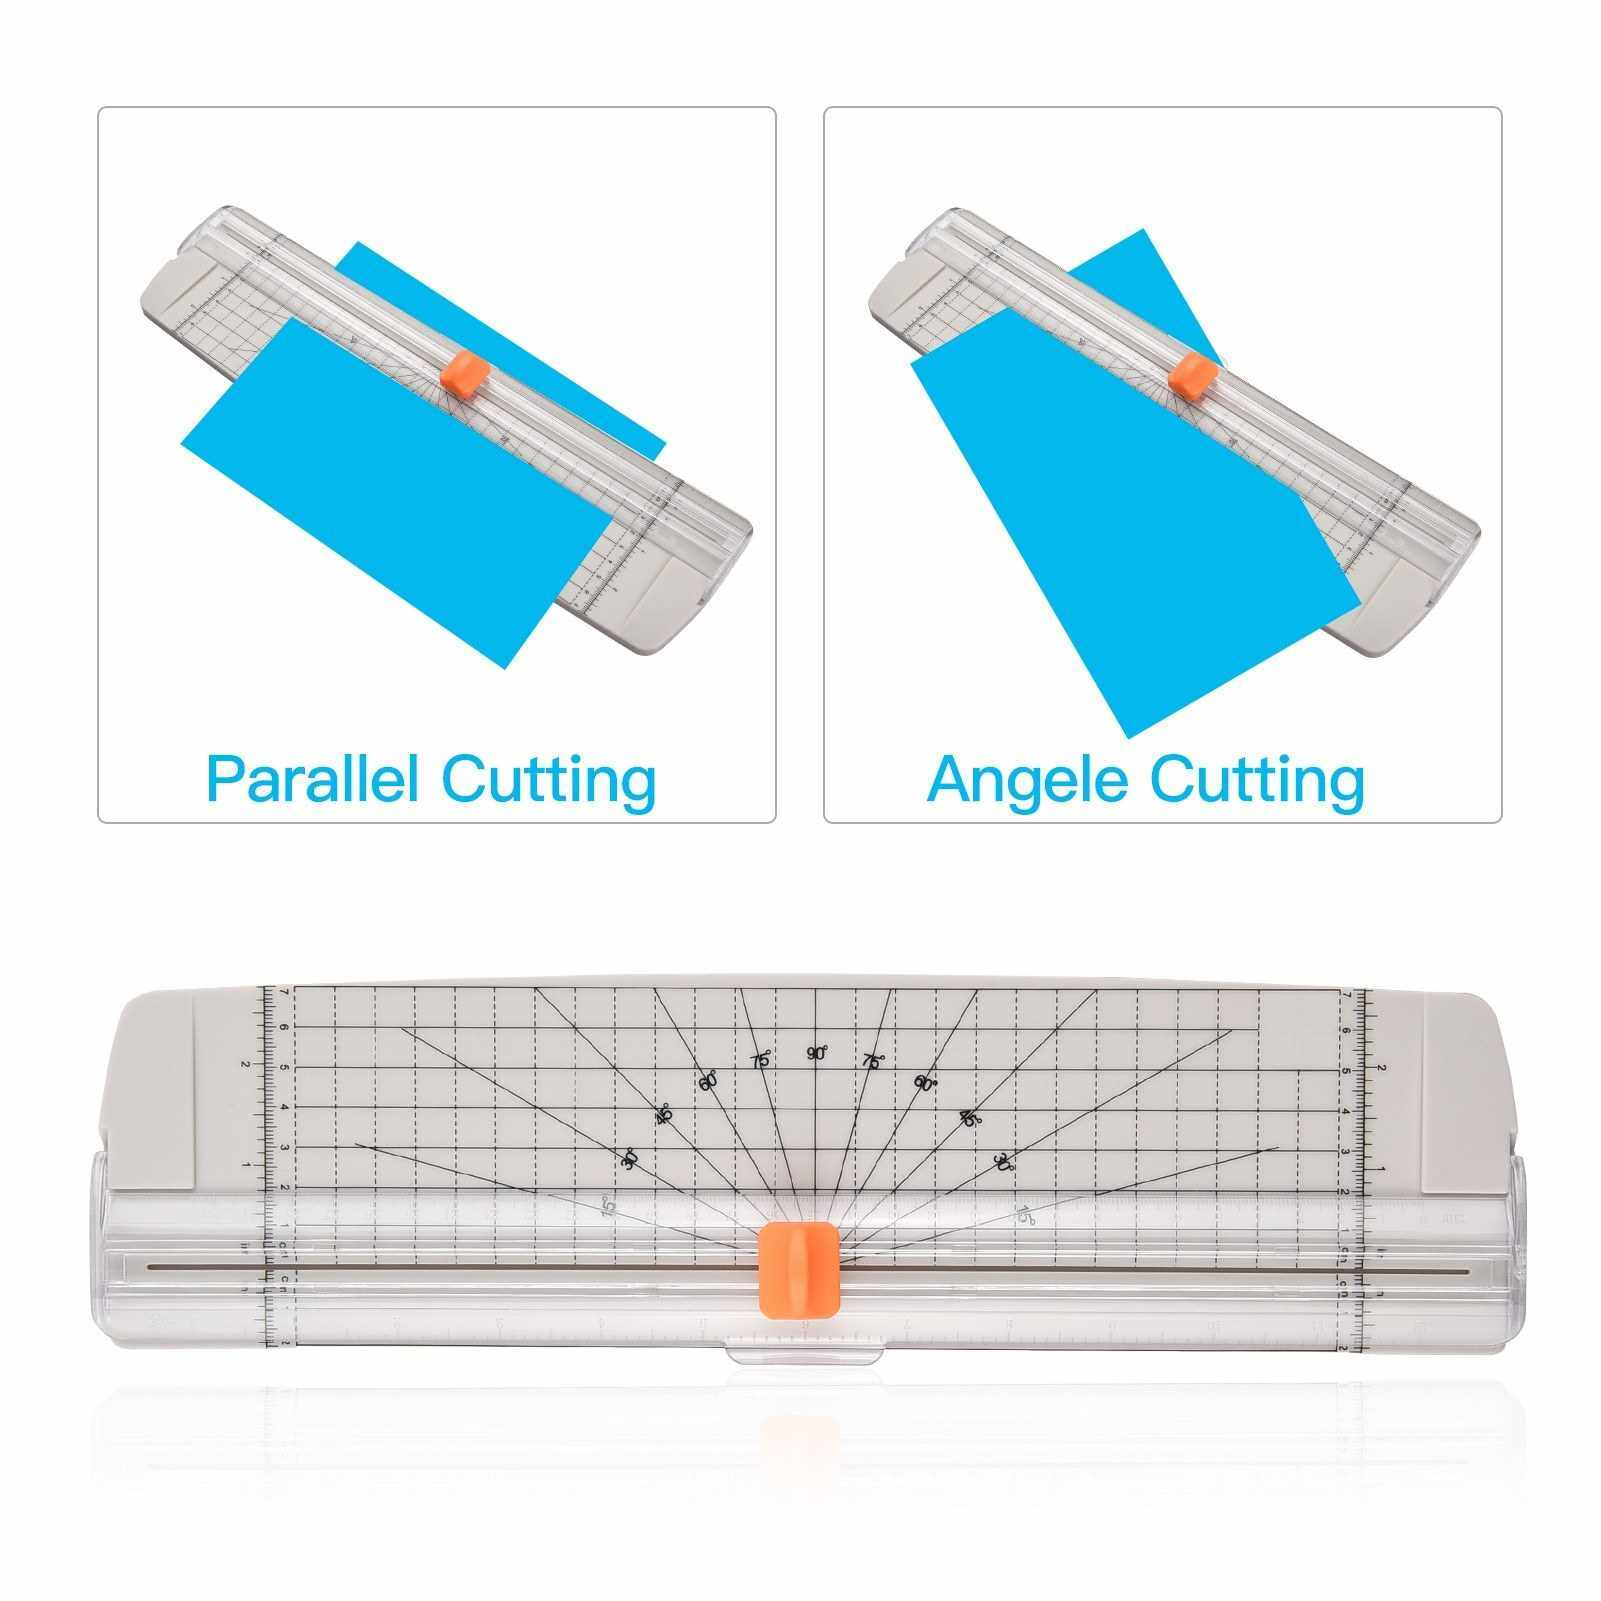 Aibecy Portable Paper Trimmer A4 Size Paper Cutter Cutting Machine 12 Inch Cutting Width for Craft Paper Photo Laminated Paper (W)